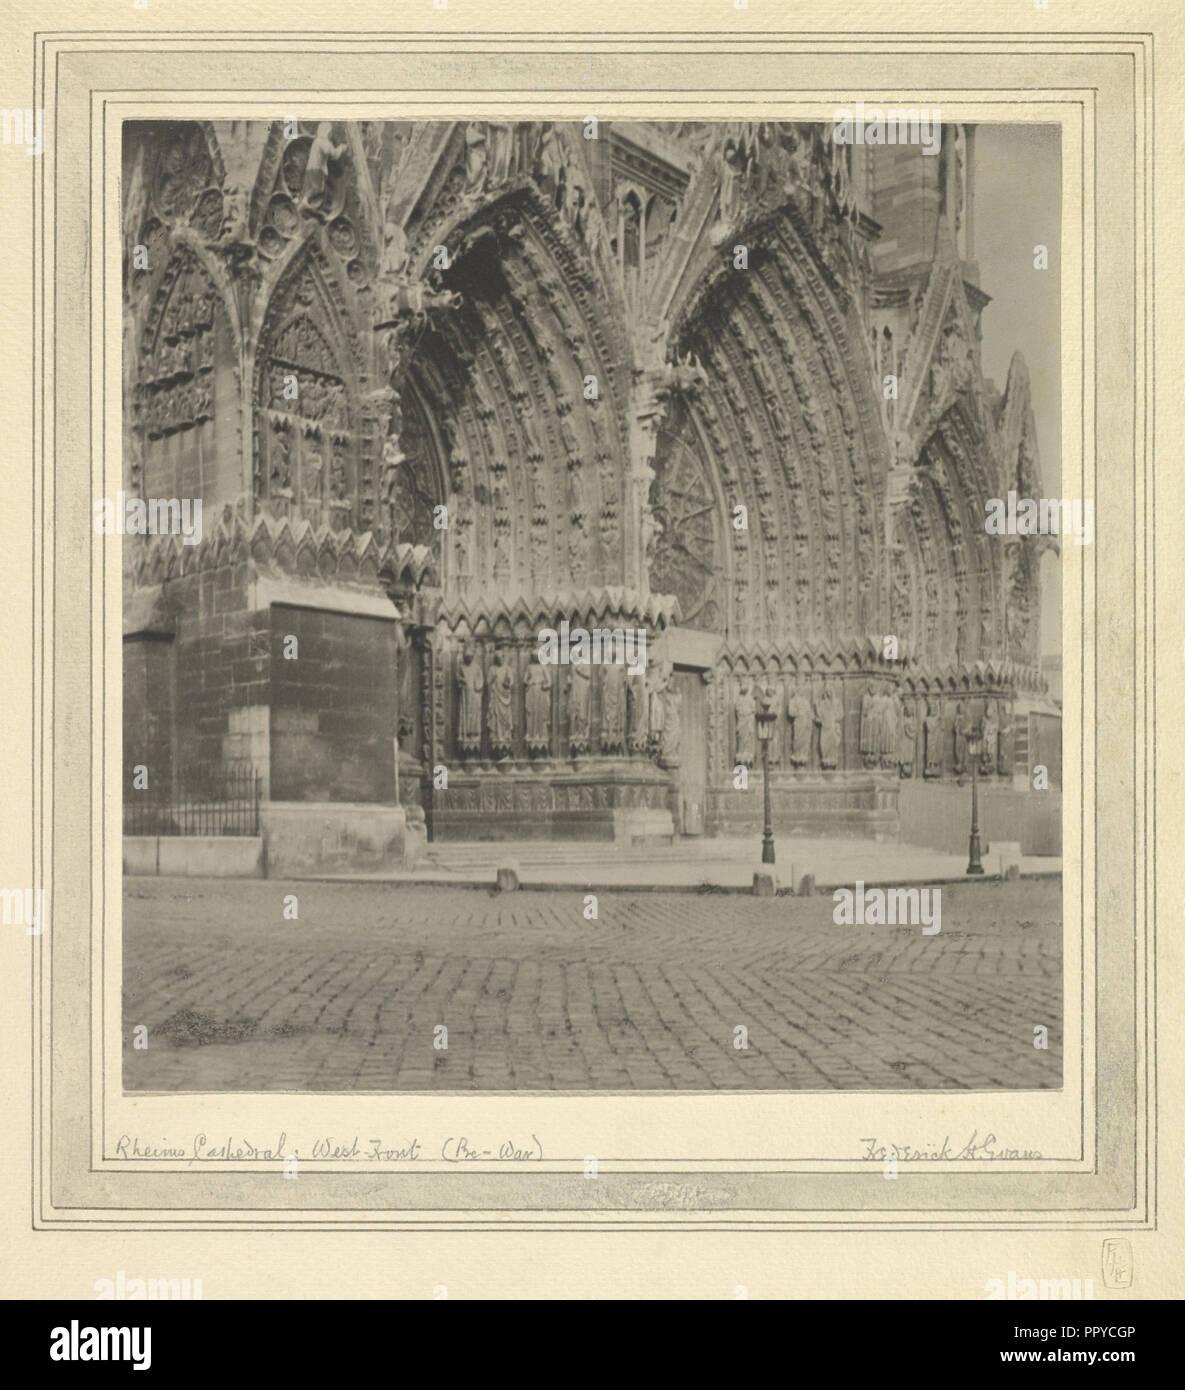 Rheims Cathedral: West-Front, Pre-War; Frederick H. Evans, British, 1853 - 1943, 1899; Platinum print; 24.8 x 24.1 cm - Stock Image